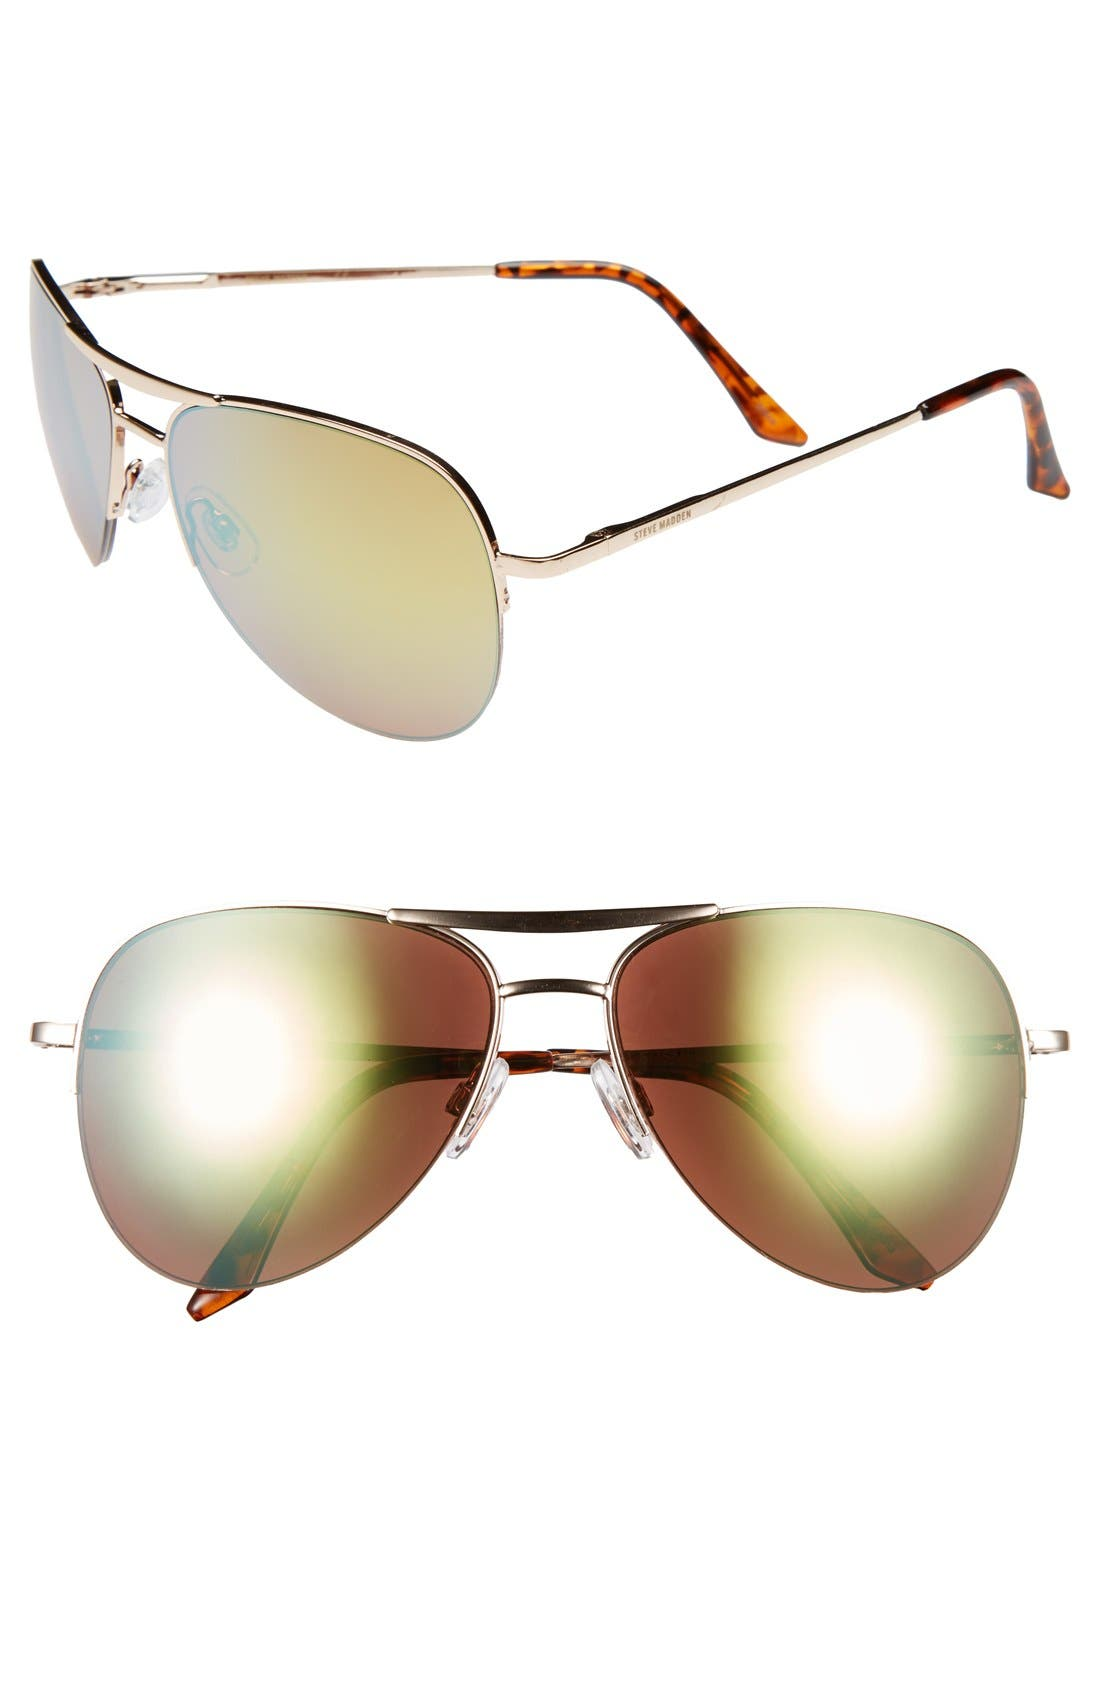 Main Image - Steve Madden Semi Rimless 55mm Aviator Sunglasses